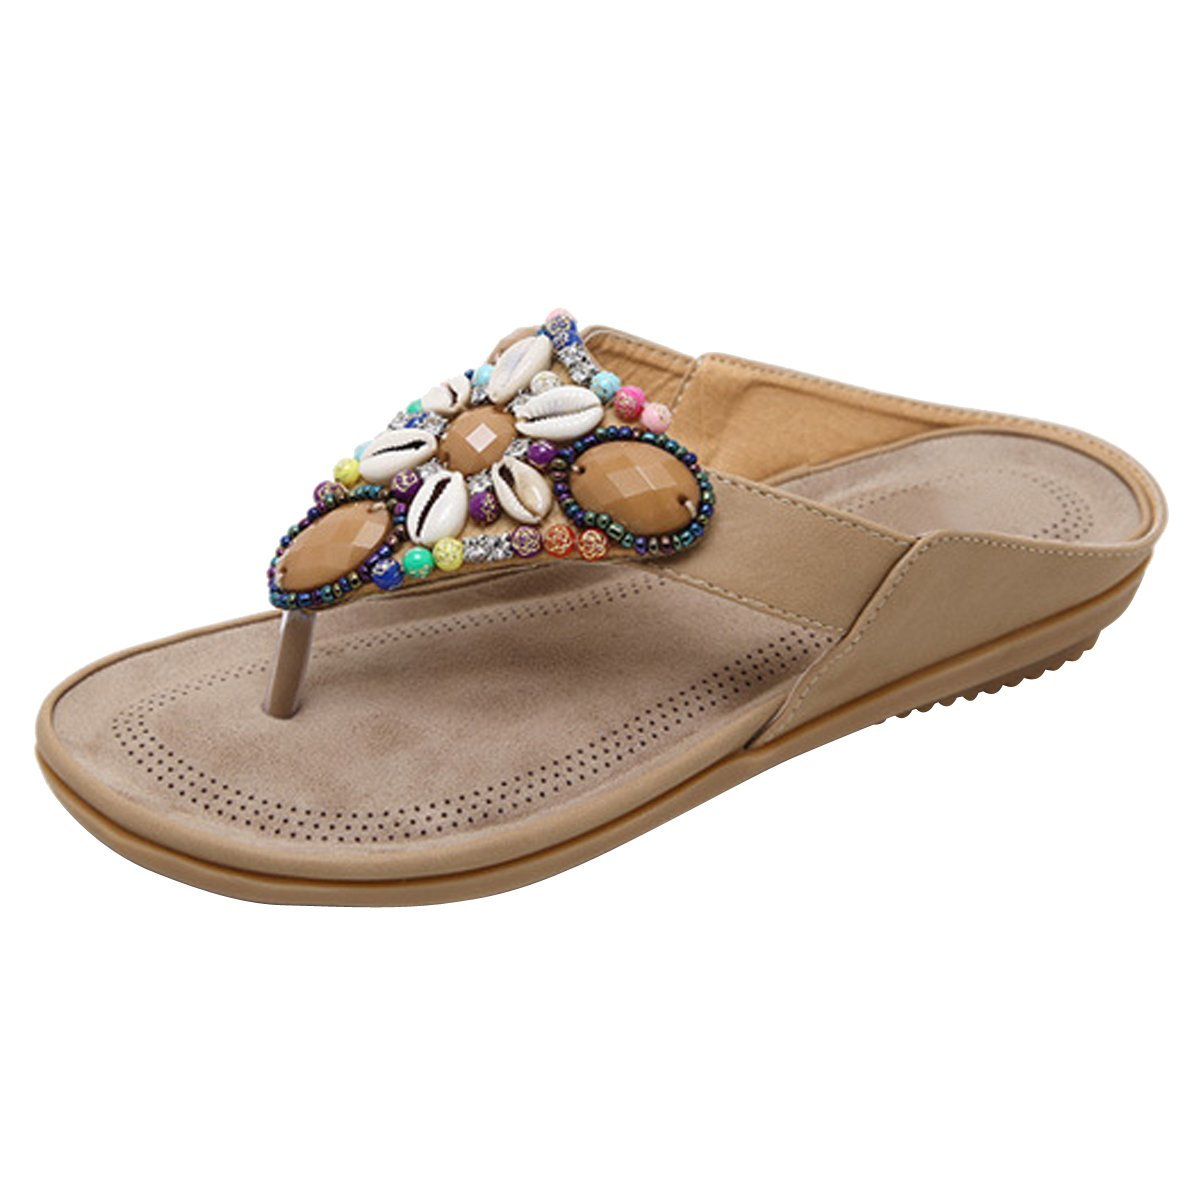 LUXINYU Women Summer Thong Sandal - Bohemia Beaded Flat Slide-on Slipper Flip Flop Shoes - 2 Assorted Color,Brown US 8.5